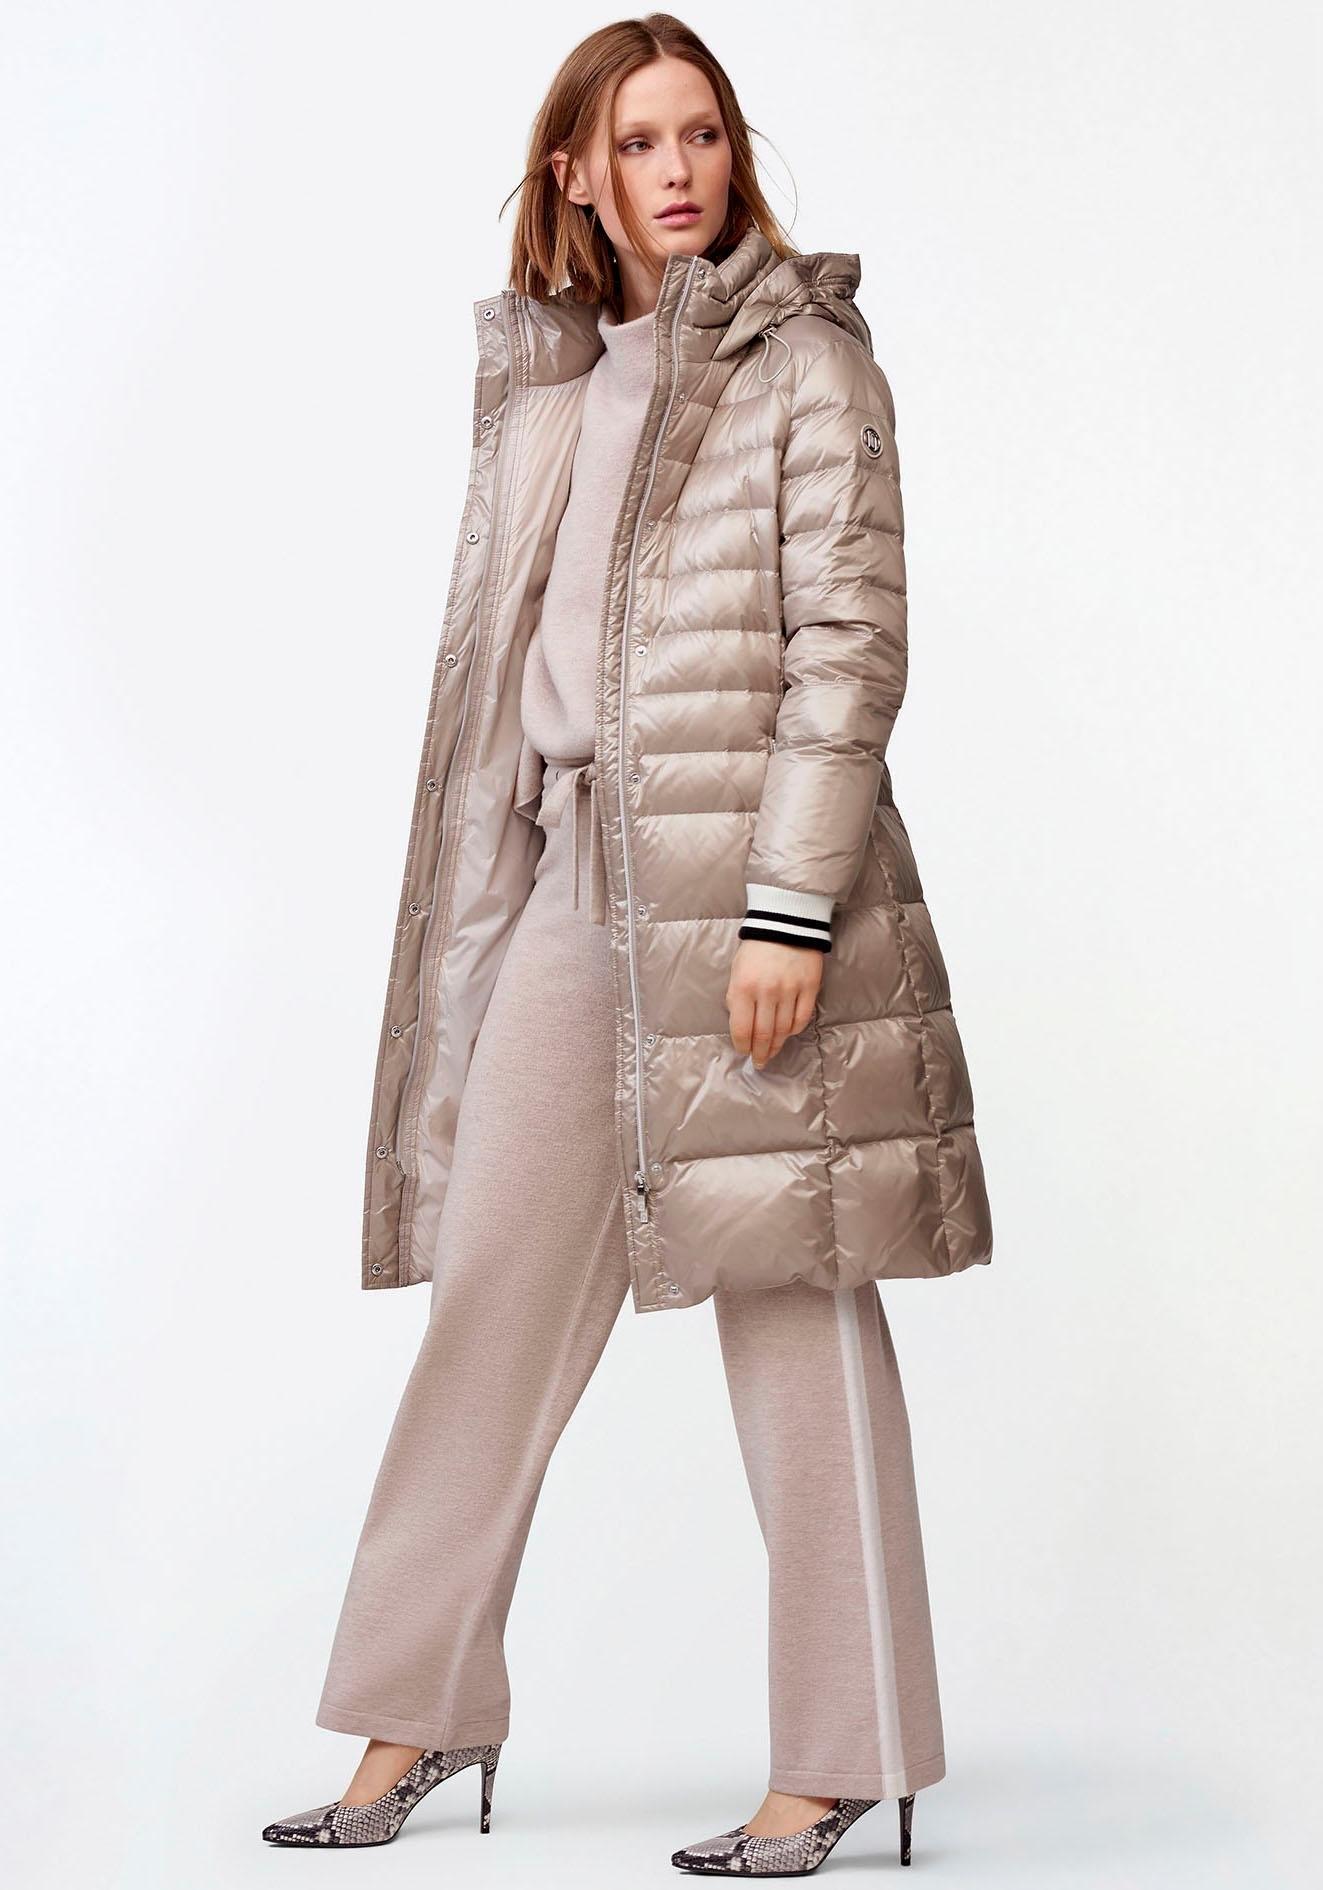 Laurèl doorgestikte mantel nu online bestellen